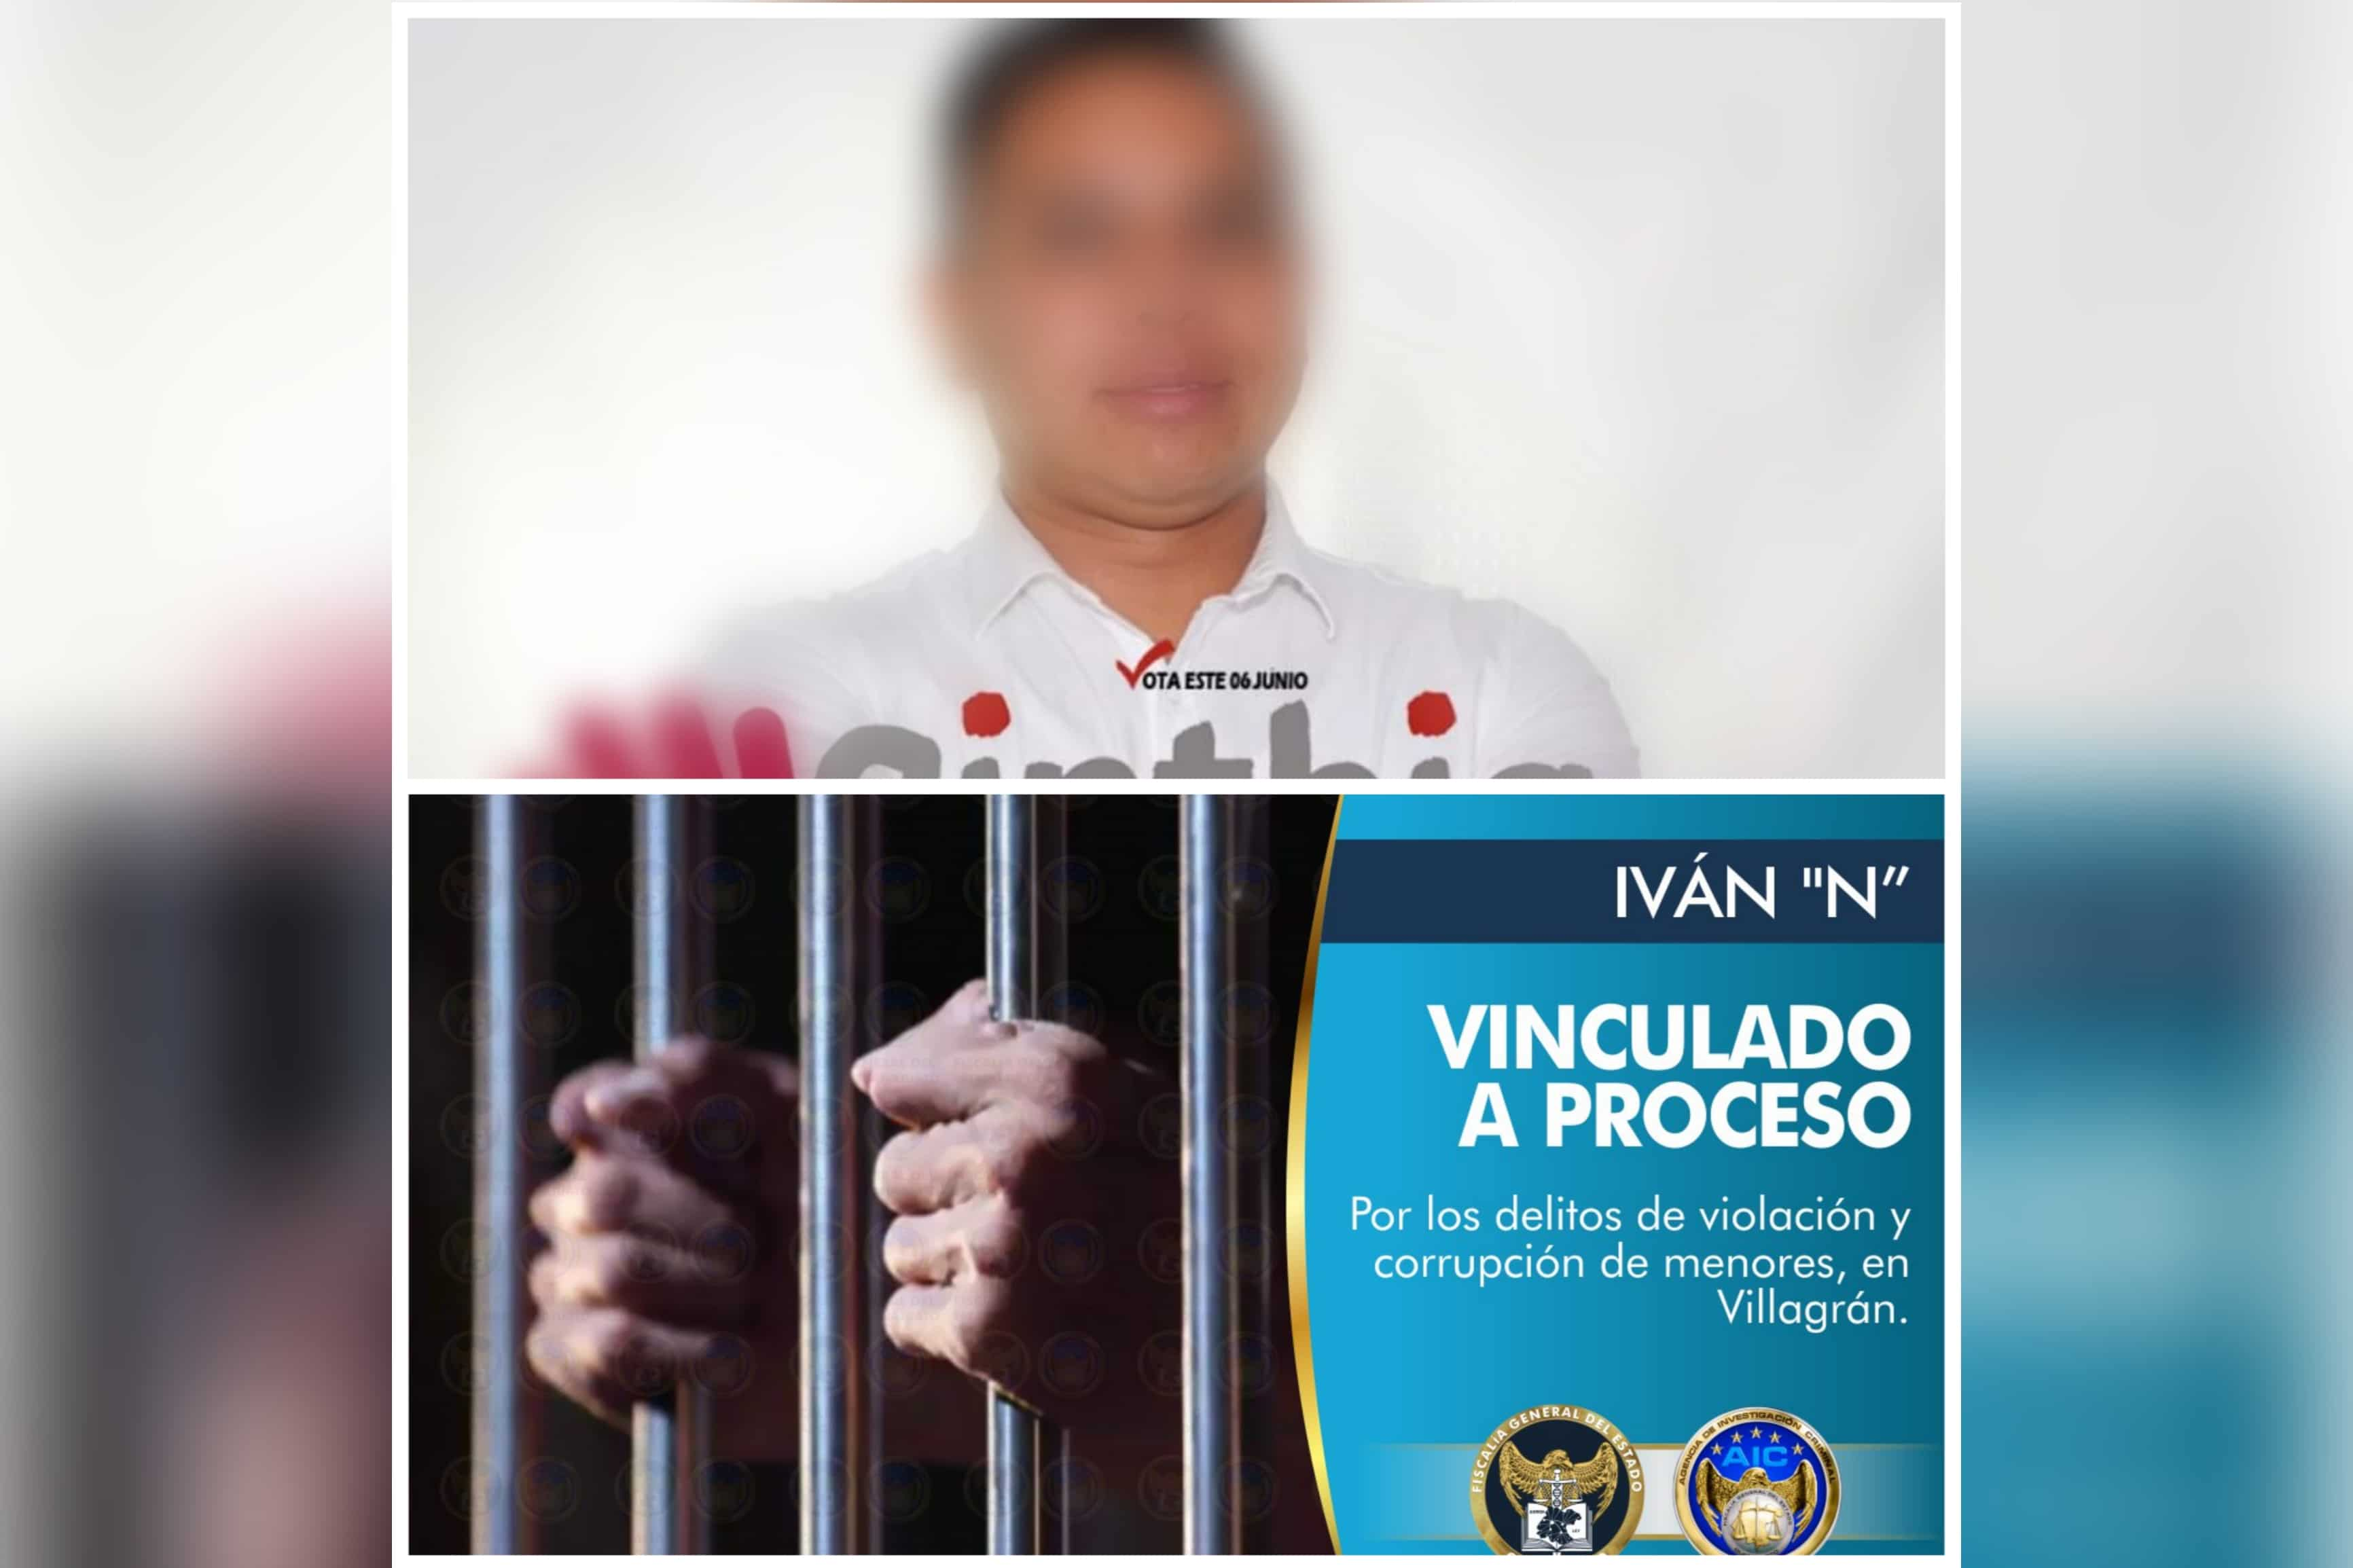 Vinculan a proceso por violación a Regidor electo de MORENA en Villagrán 1